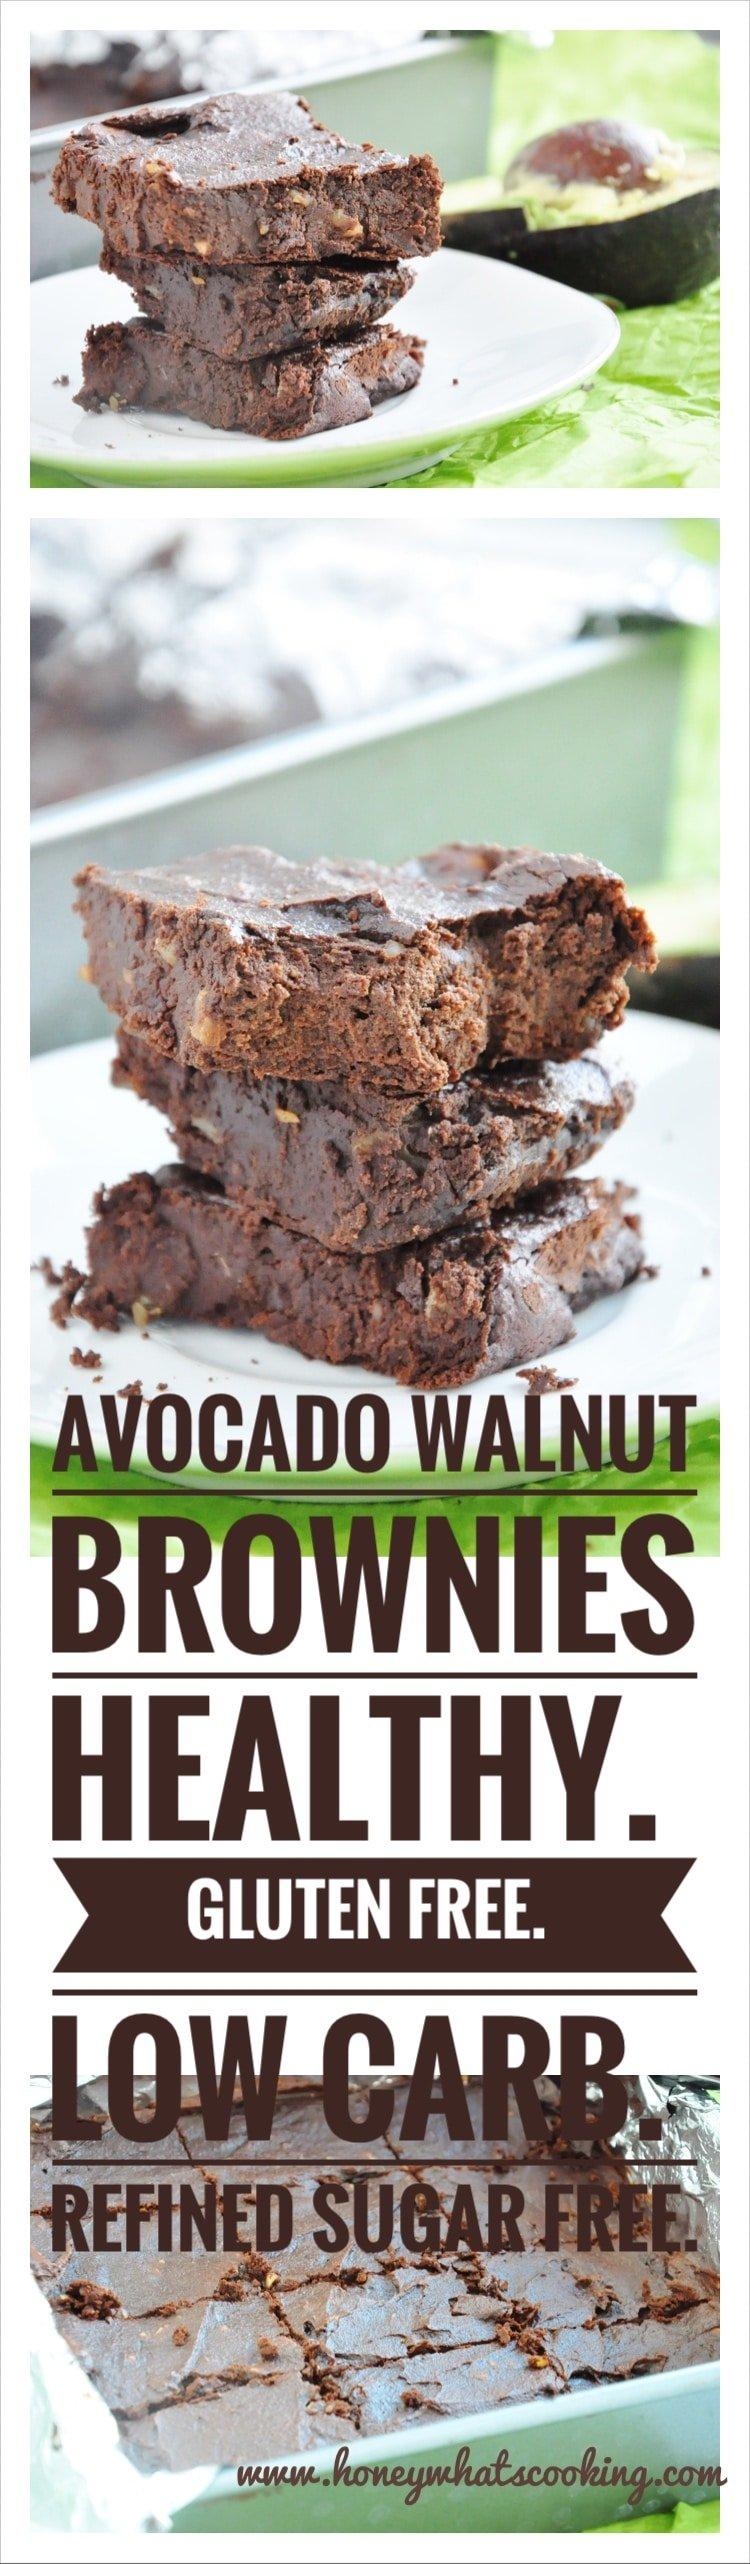 Avocado Walnut Brownies Pin